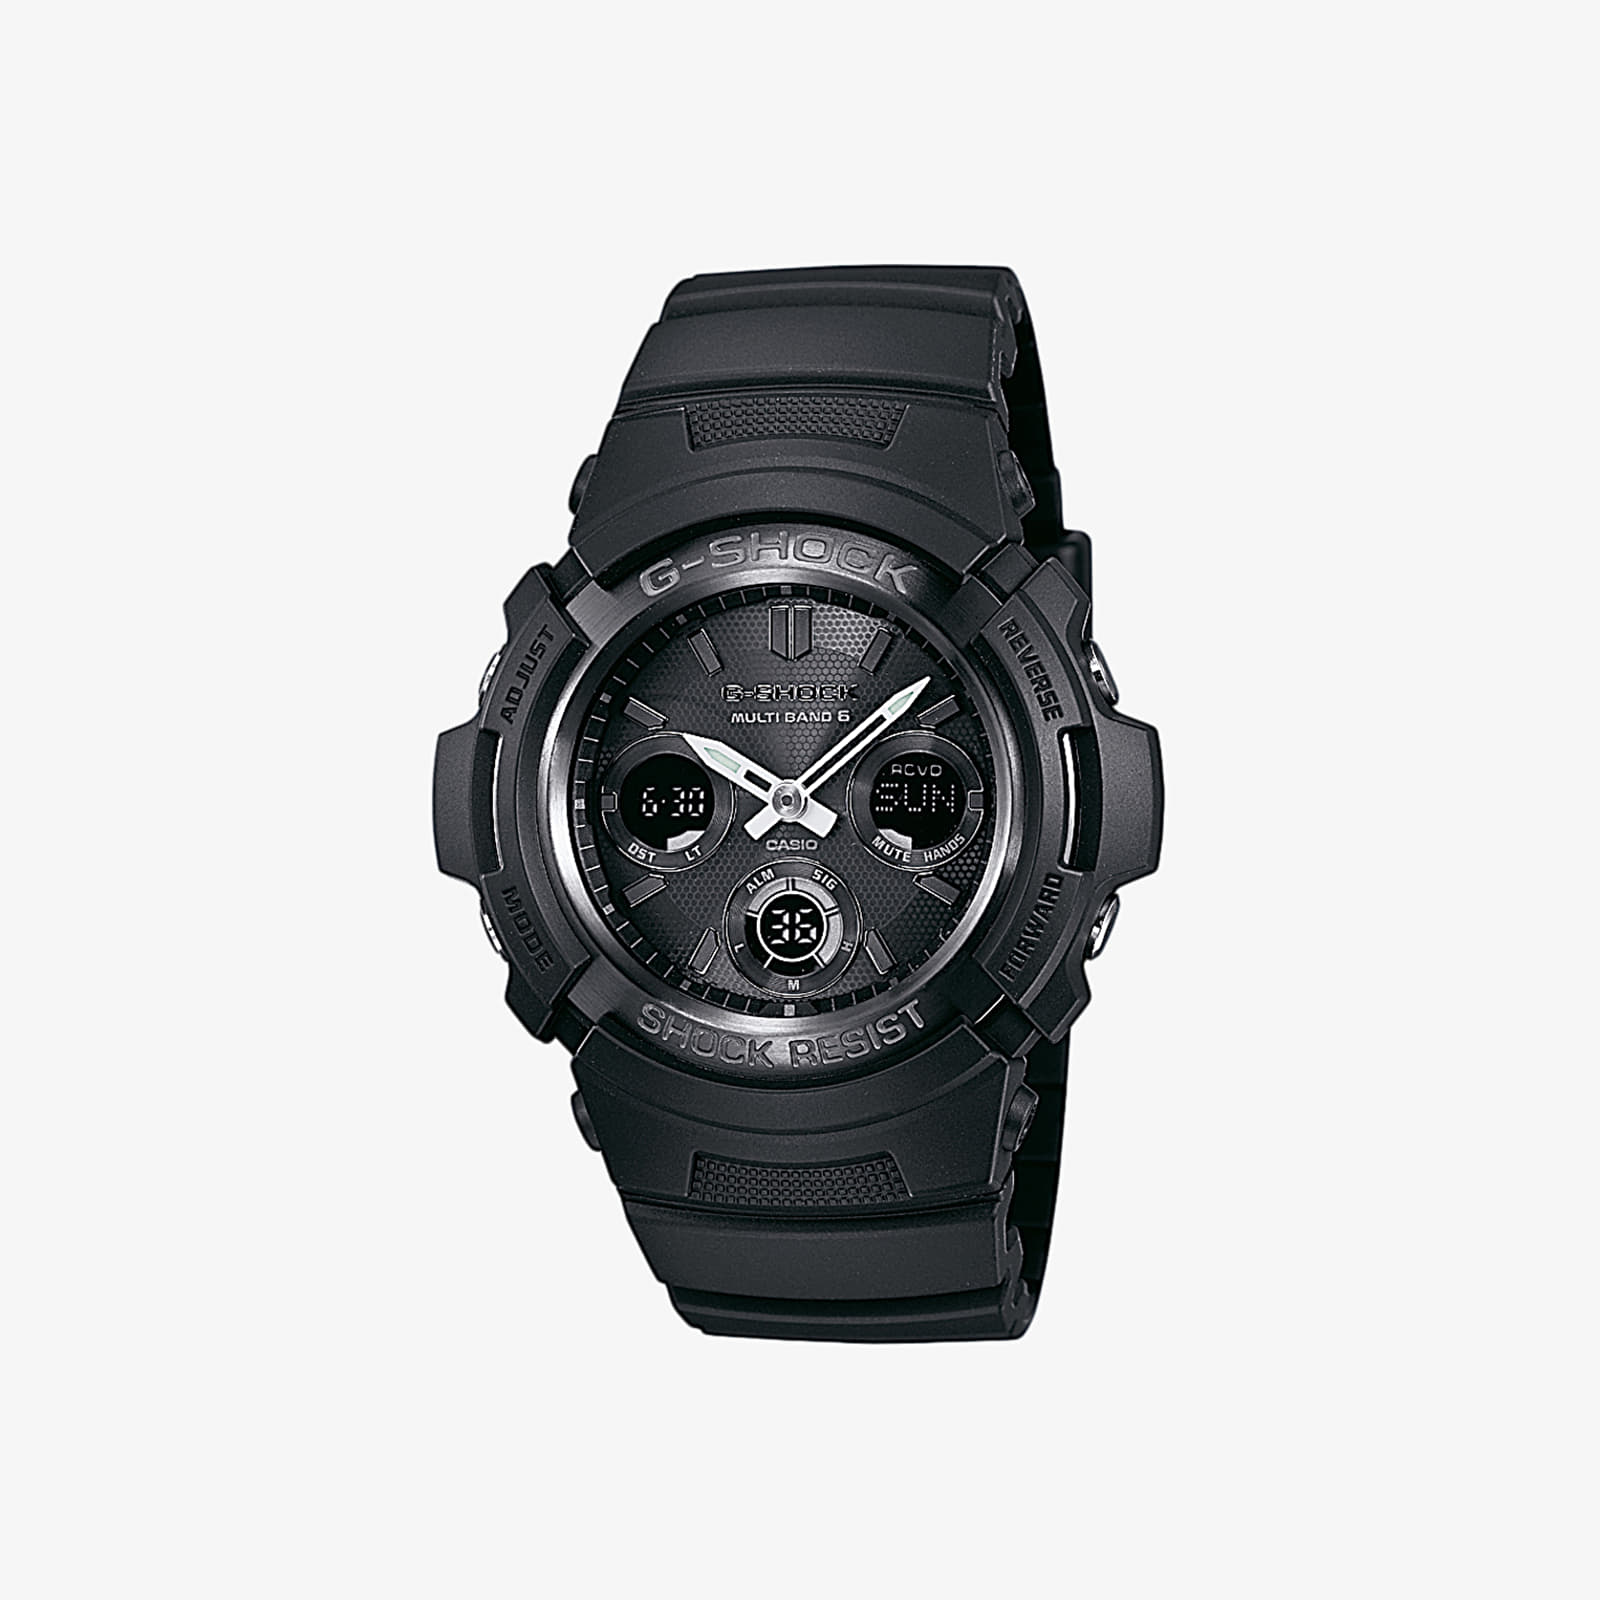 Casio G-shock AWG-M100B-1AER Black Universal